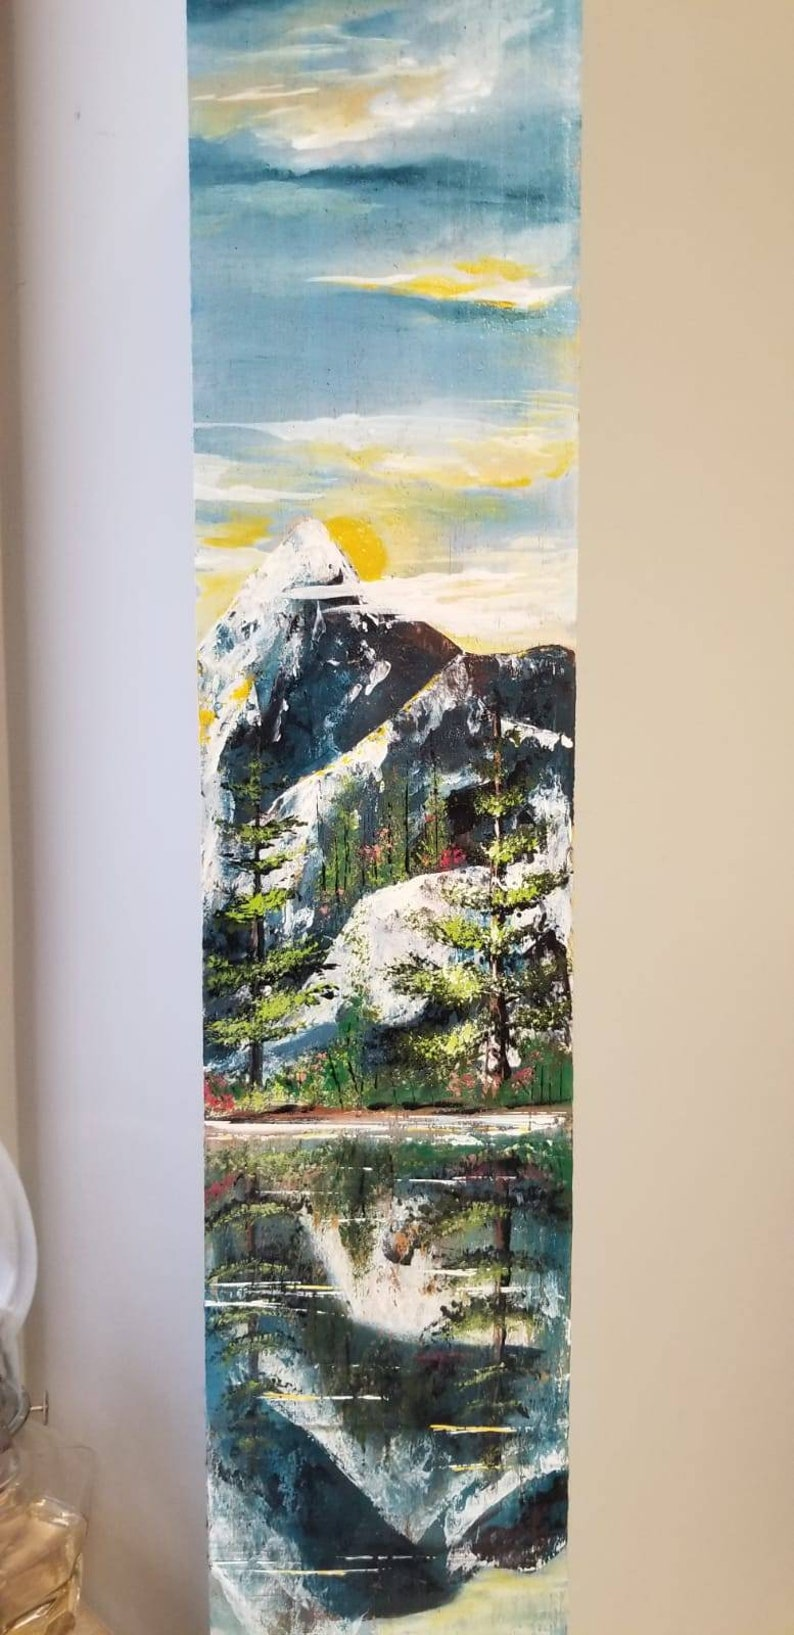 Handpainted Wood Plank Board Art Original Wall Art Decor Painting